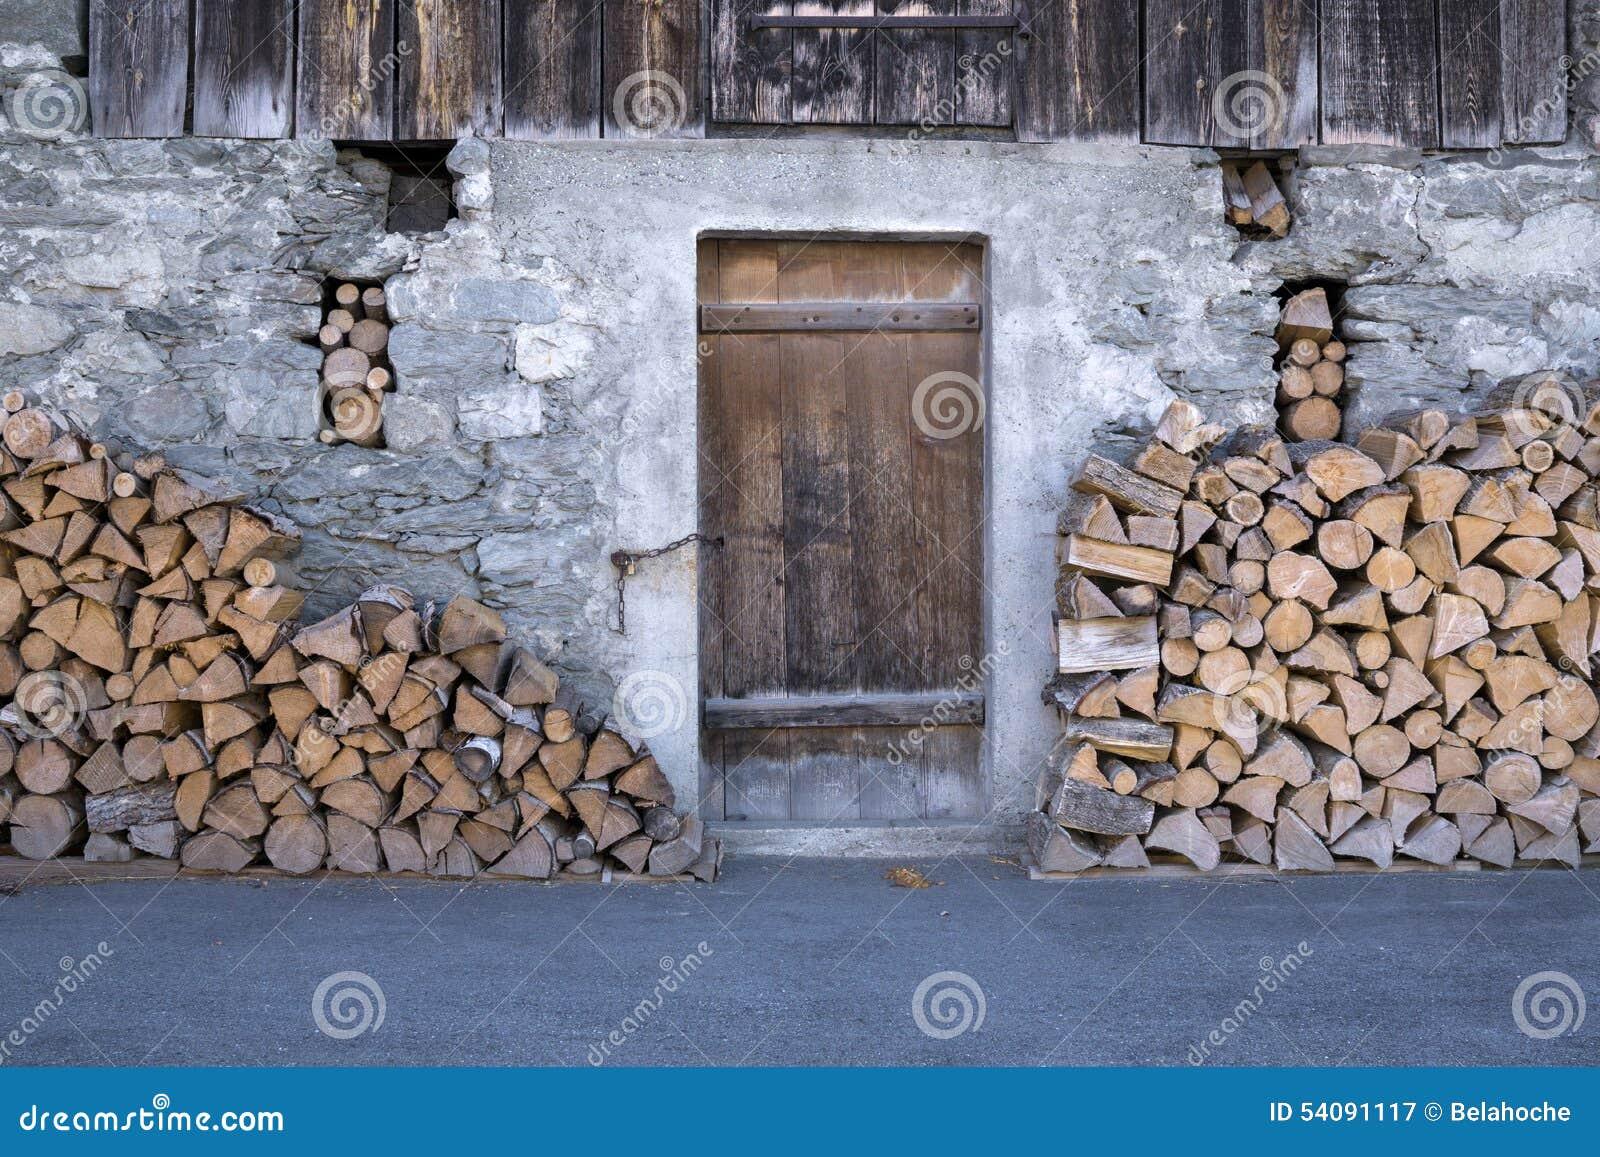 rustikale scheune mit stapeln brennholz stockbild bild. Black Bedroom Furniture Sets. Home Design Ideas